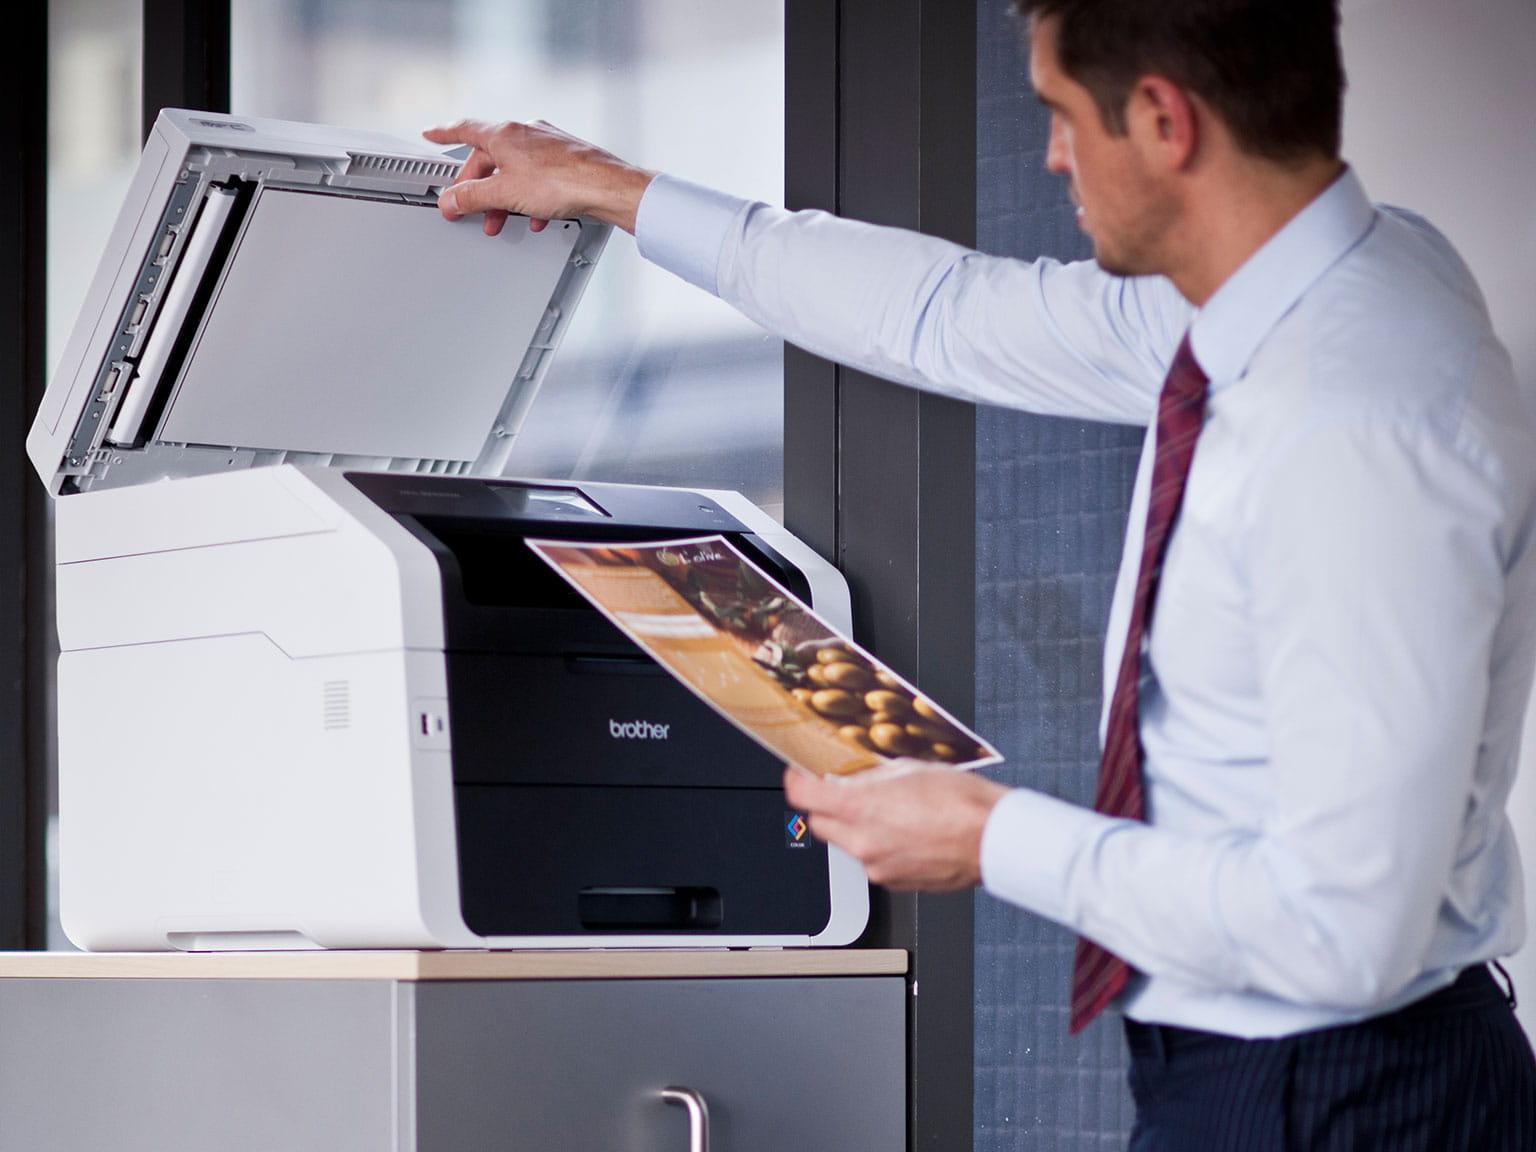 Guy using Brother printer